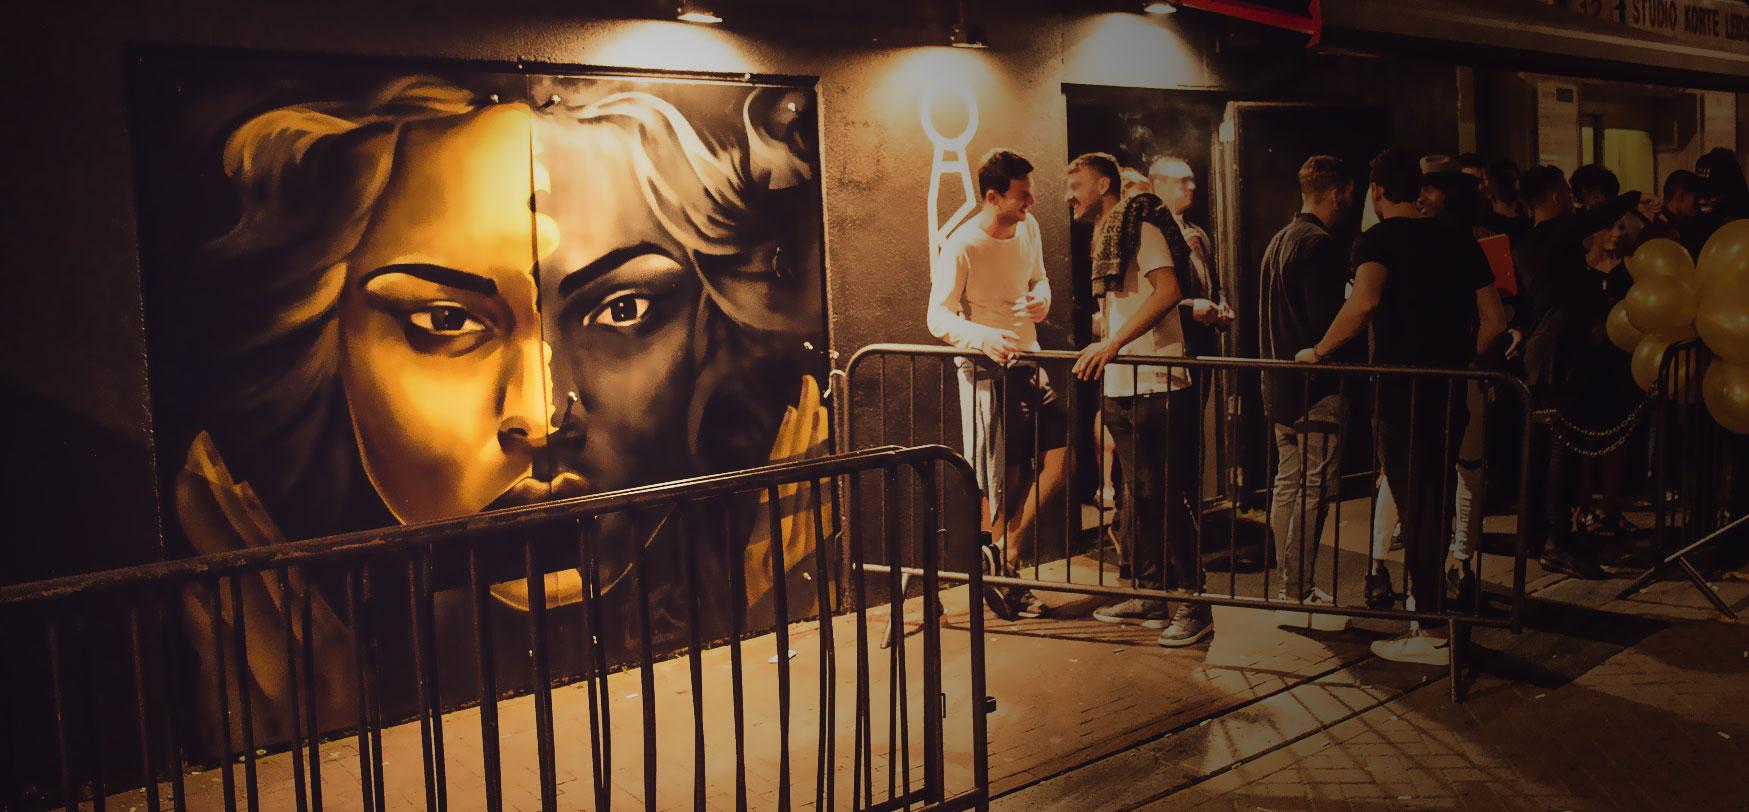 Graffiti walls club oaK Amsterdam BatArtworks